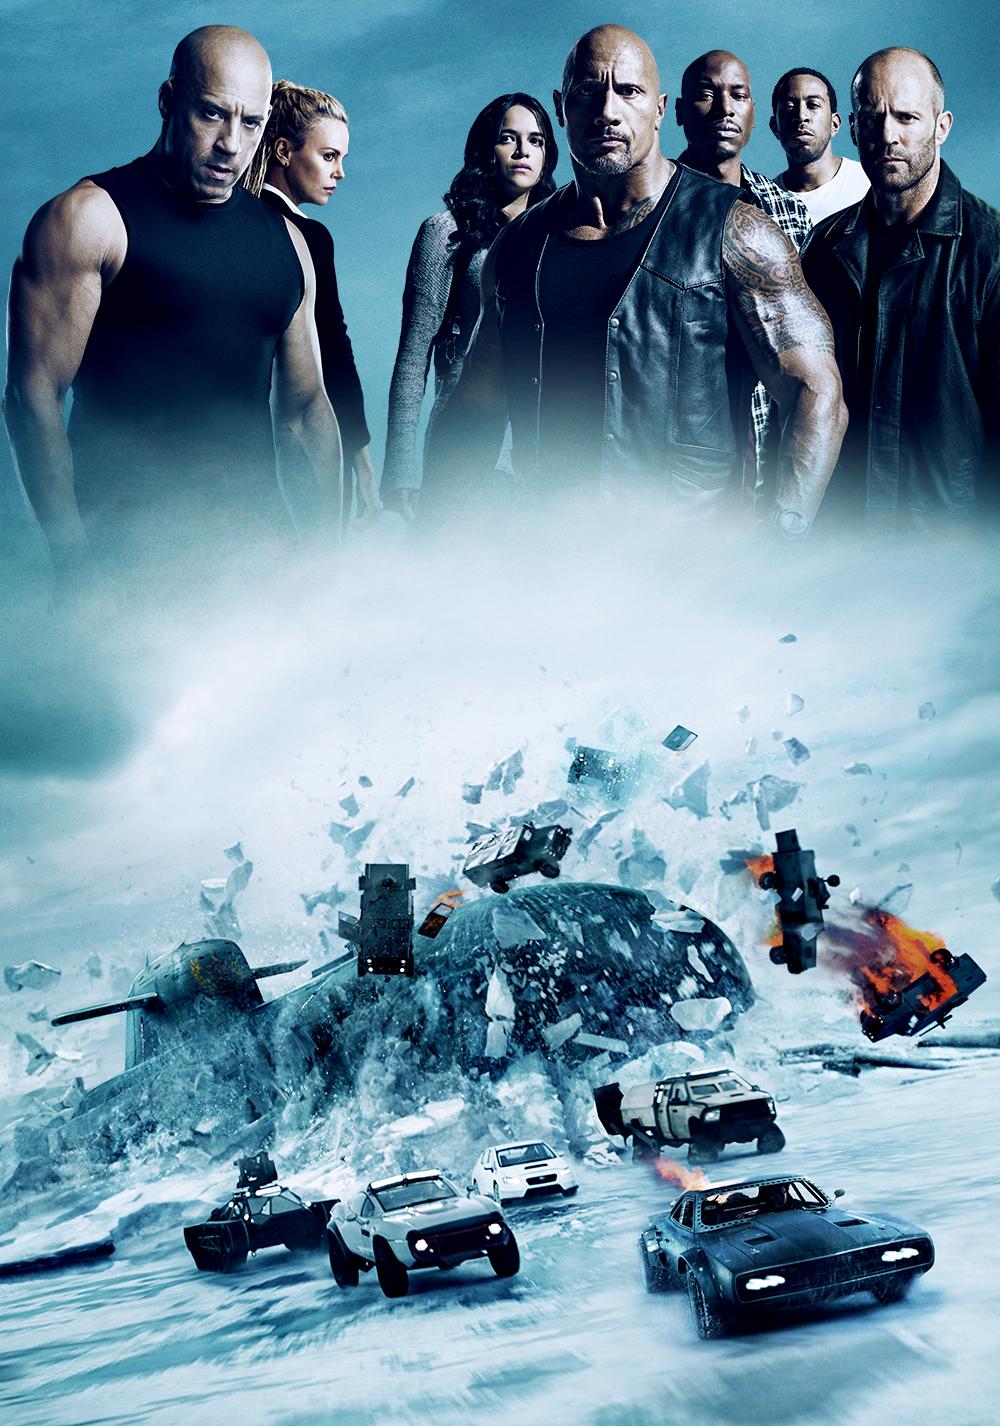 The Fate of the Furious | Movie fanart | fanart.tv